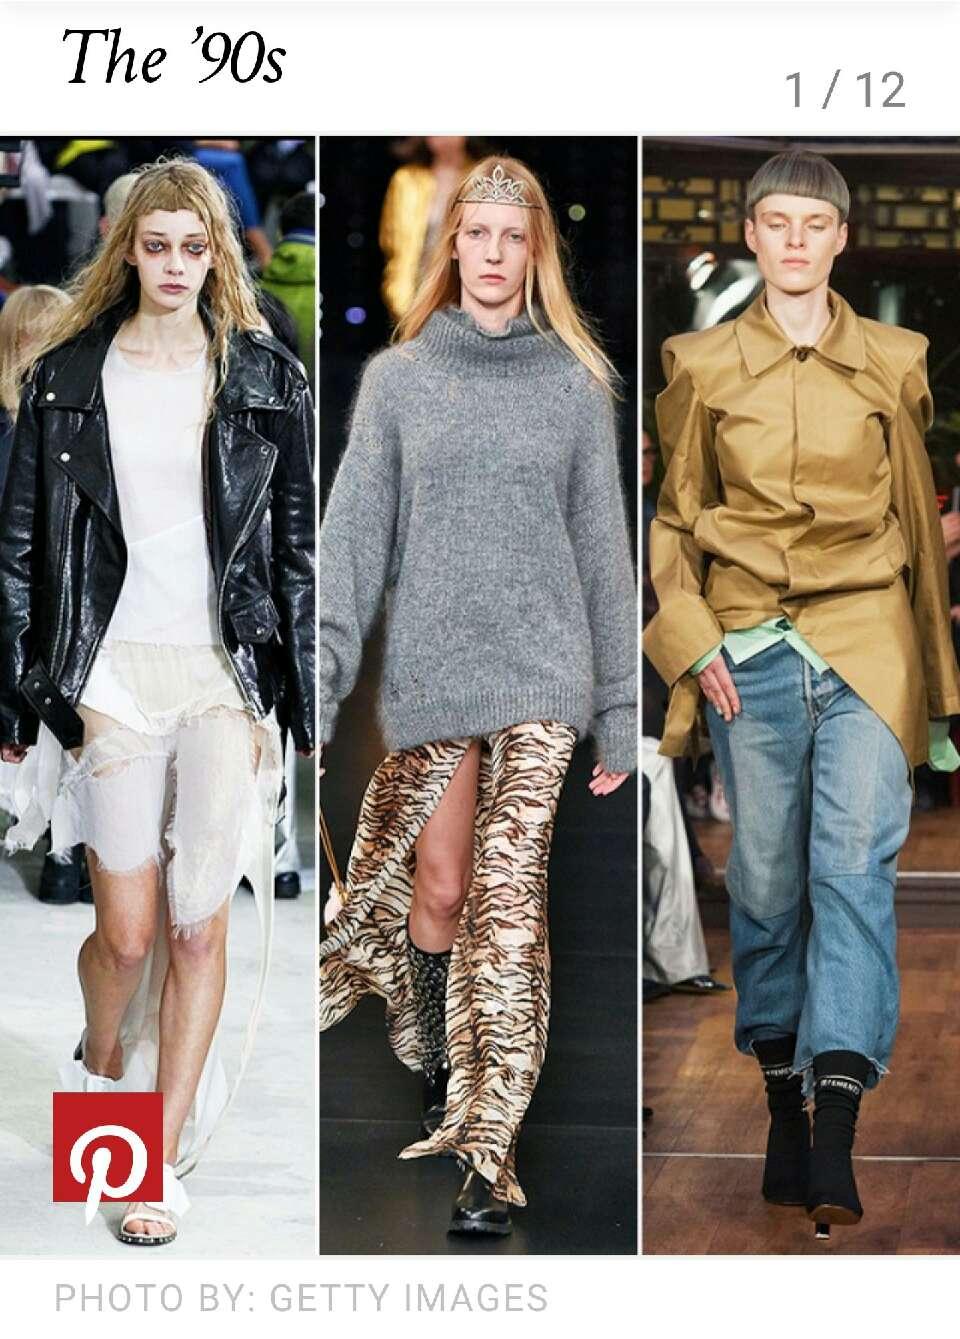 2015 minus  25 (avg age of designers) equals 1990  bringing back fashion from their childhood #nostalgic